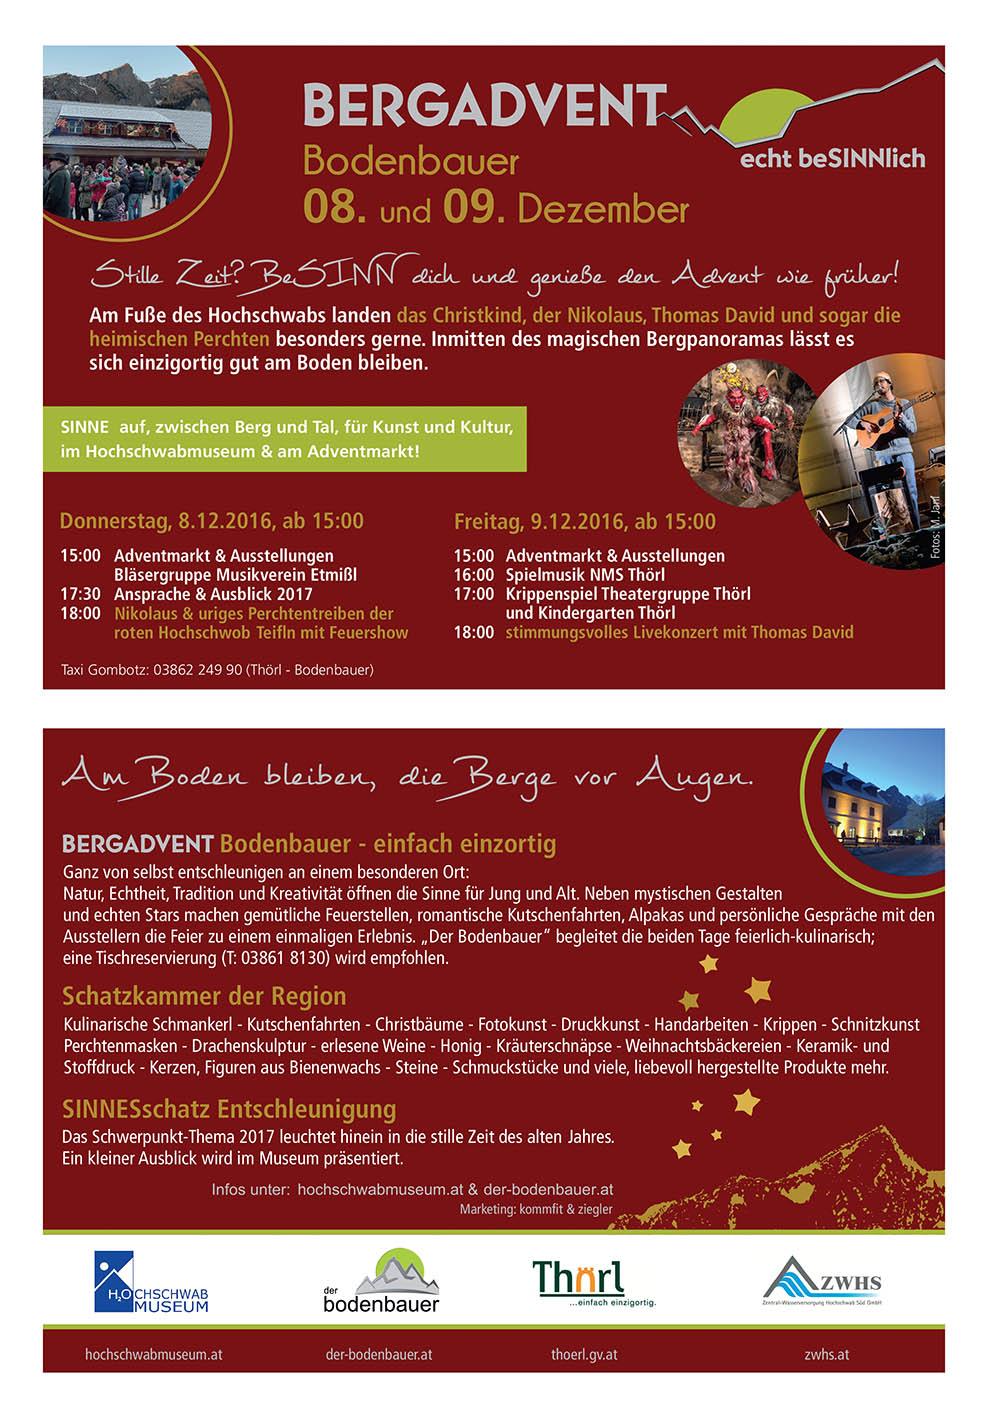 Tourismusprojekt als Besuchermagnet:  Full Service online & offline, Bergadvent Bodenbauer